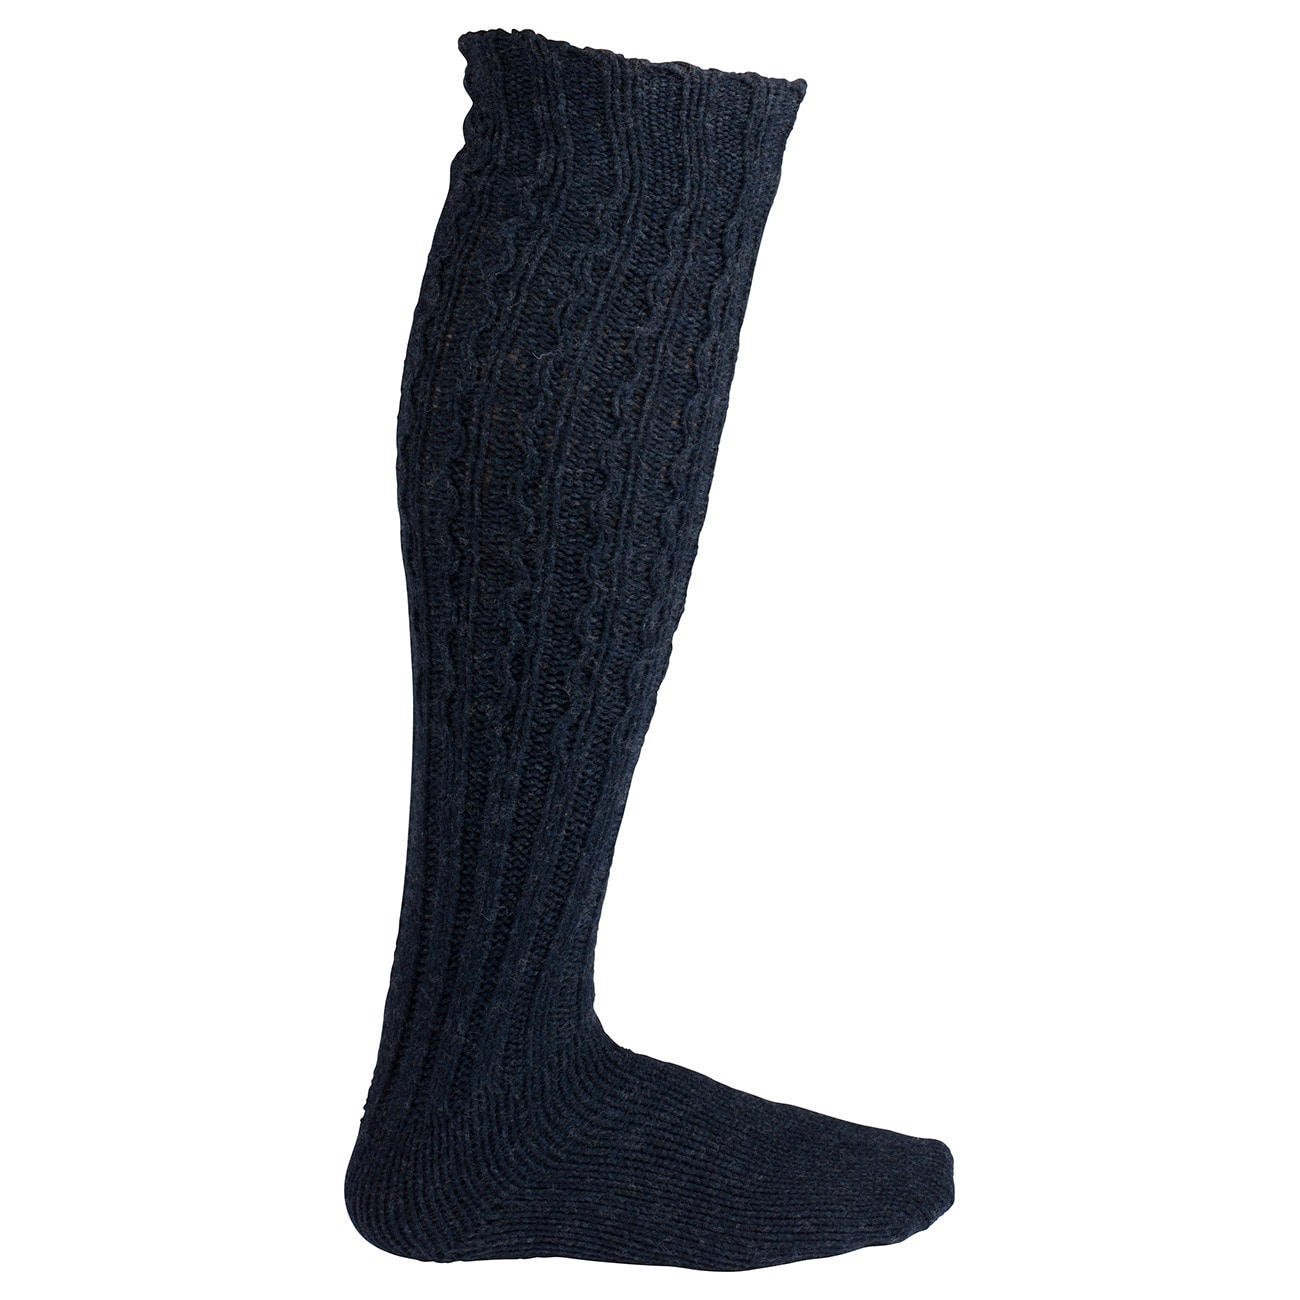 Amundsen Sports Traditional Sock, Unisex